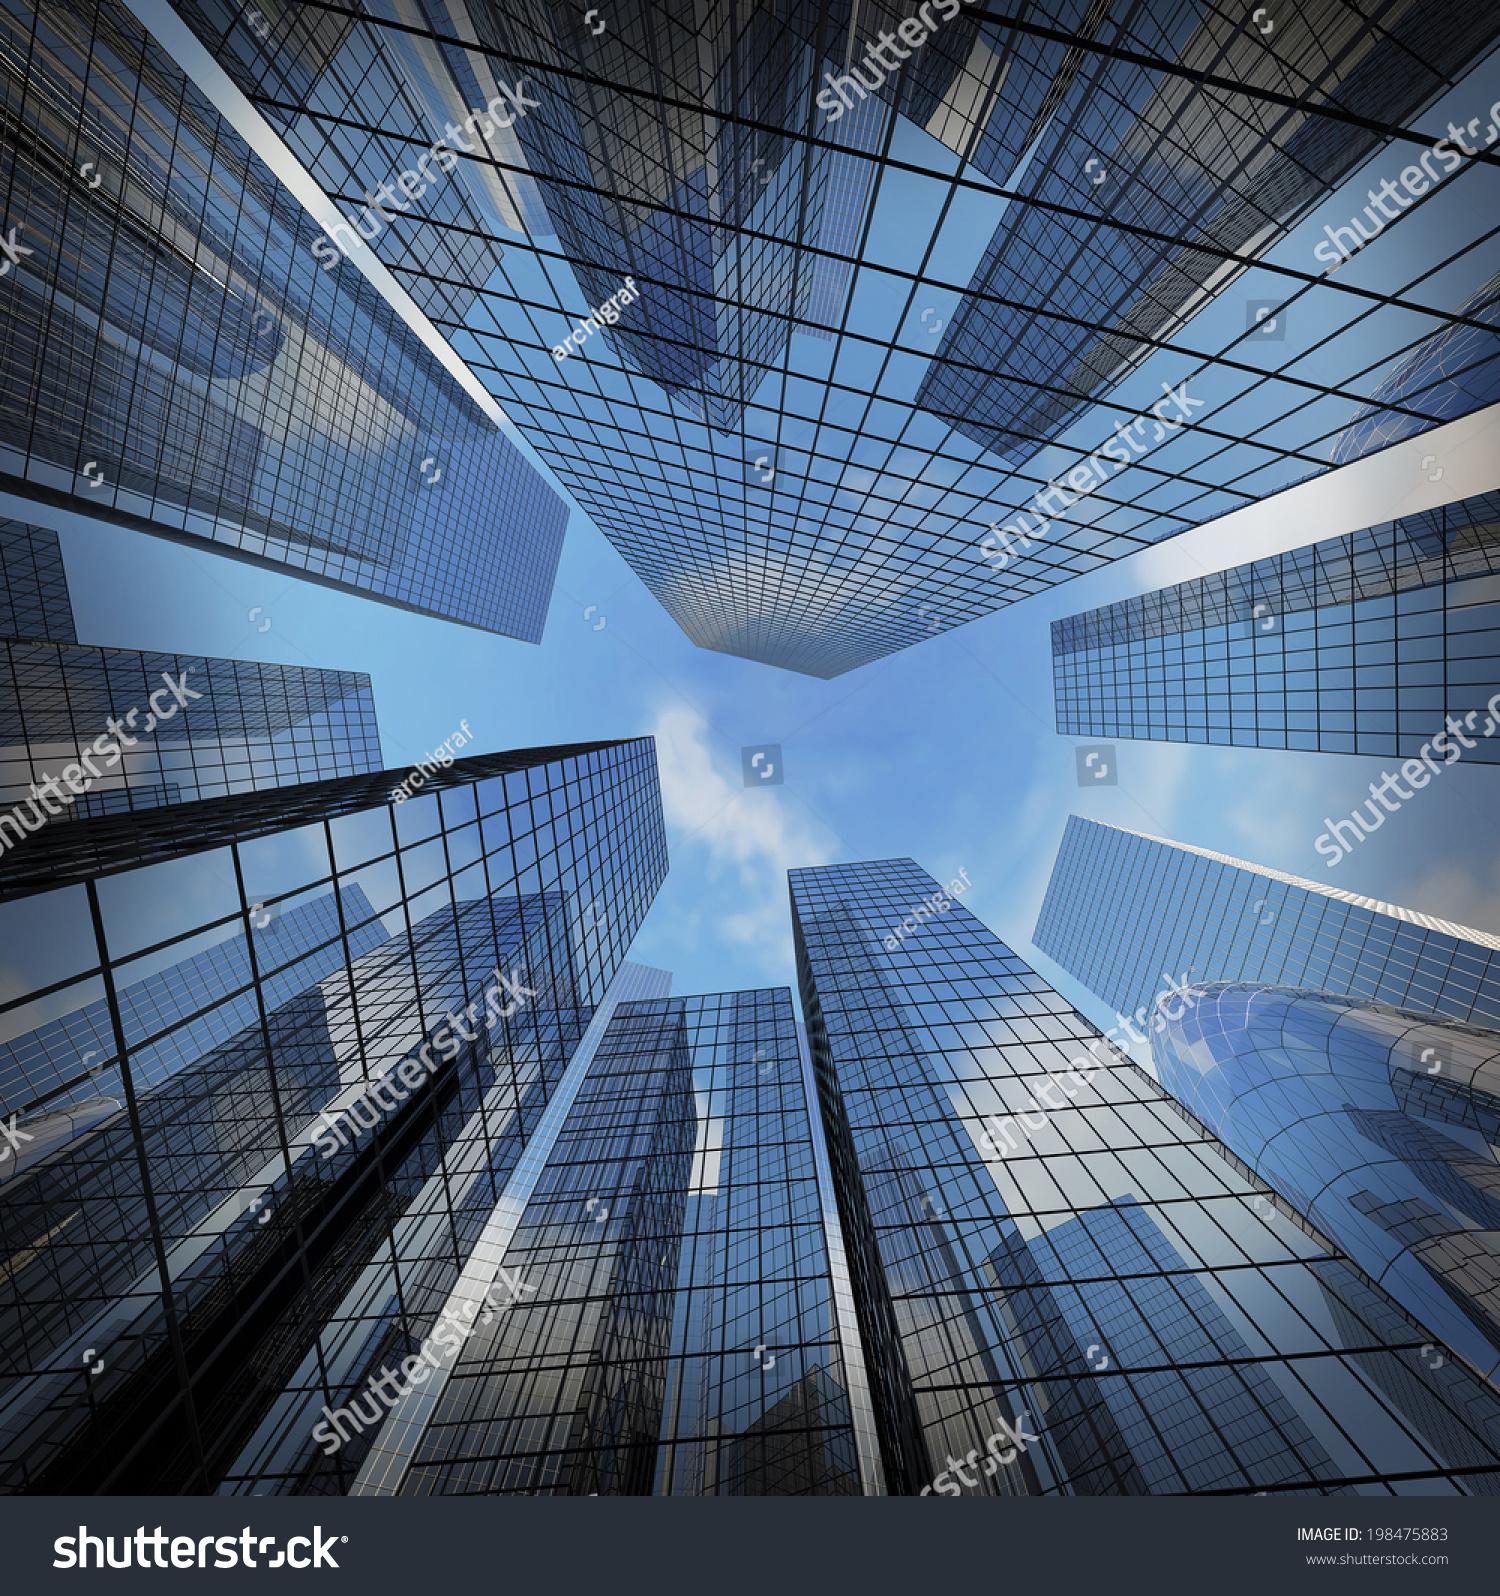 High Tech Modern Architecture Buildings: Background Glass Highrise Building Skyscraper Modern Stock